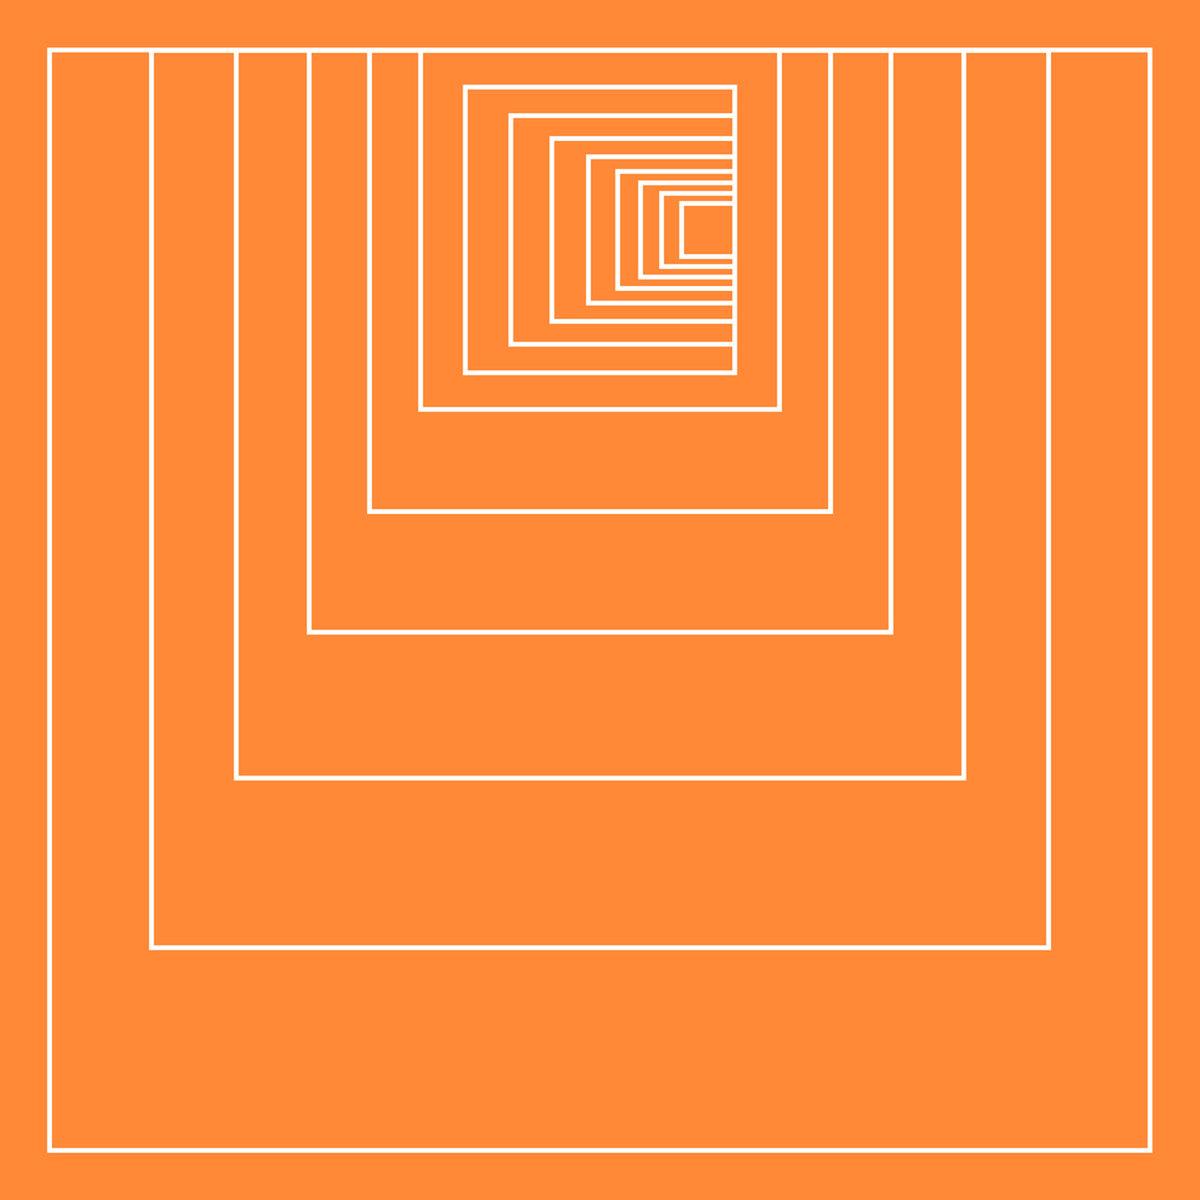 DANIEL BRANDT - ETERNAL SOMETHING (ERASED TAPES, 2017)